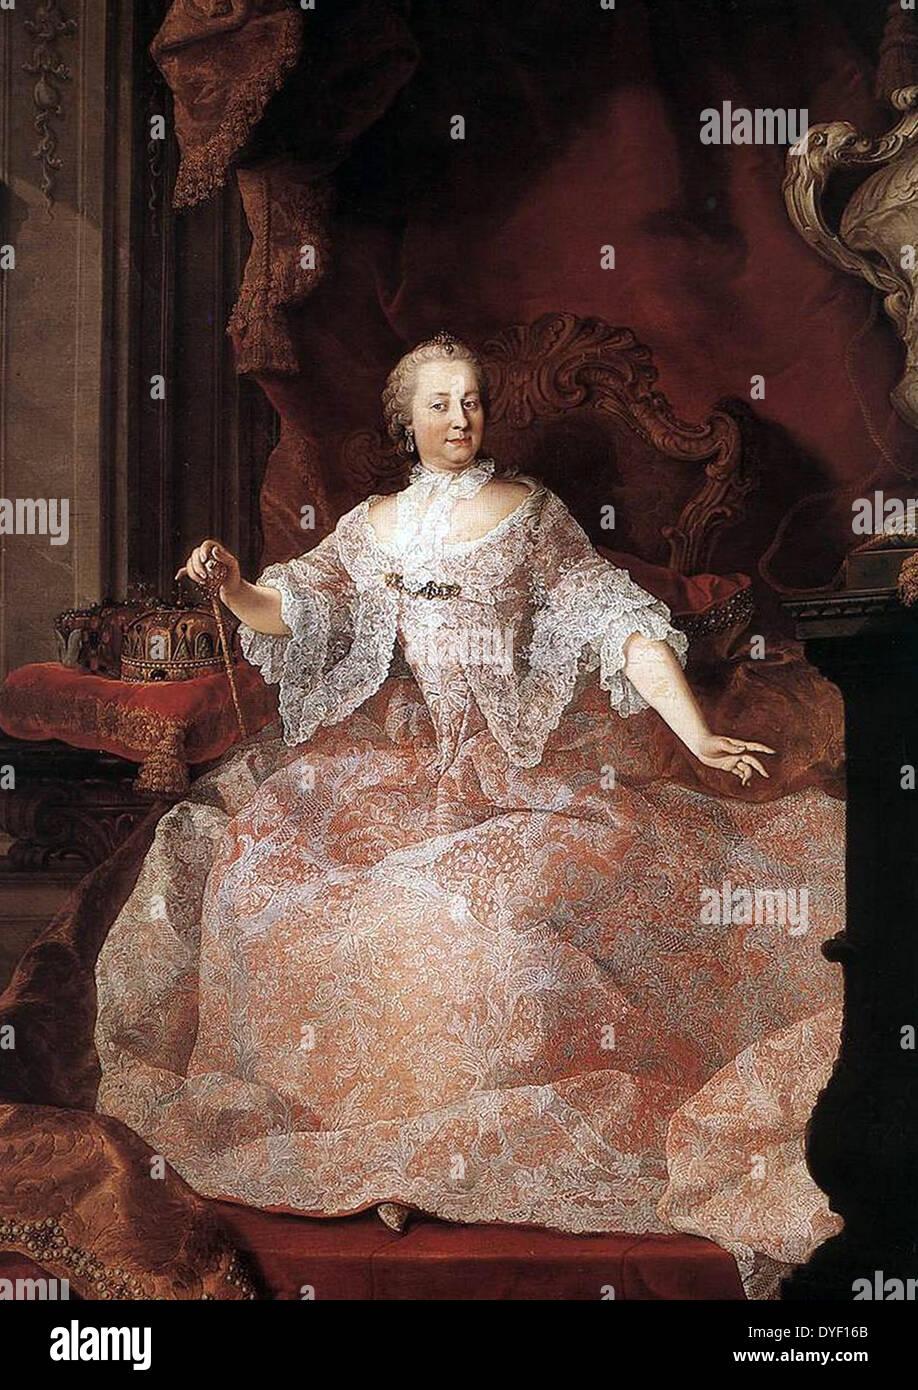 Empress Maria Theresa of Austria - Stock Image